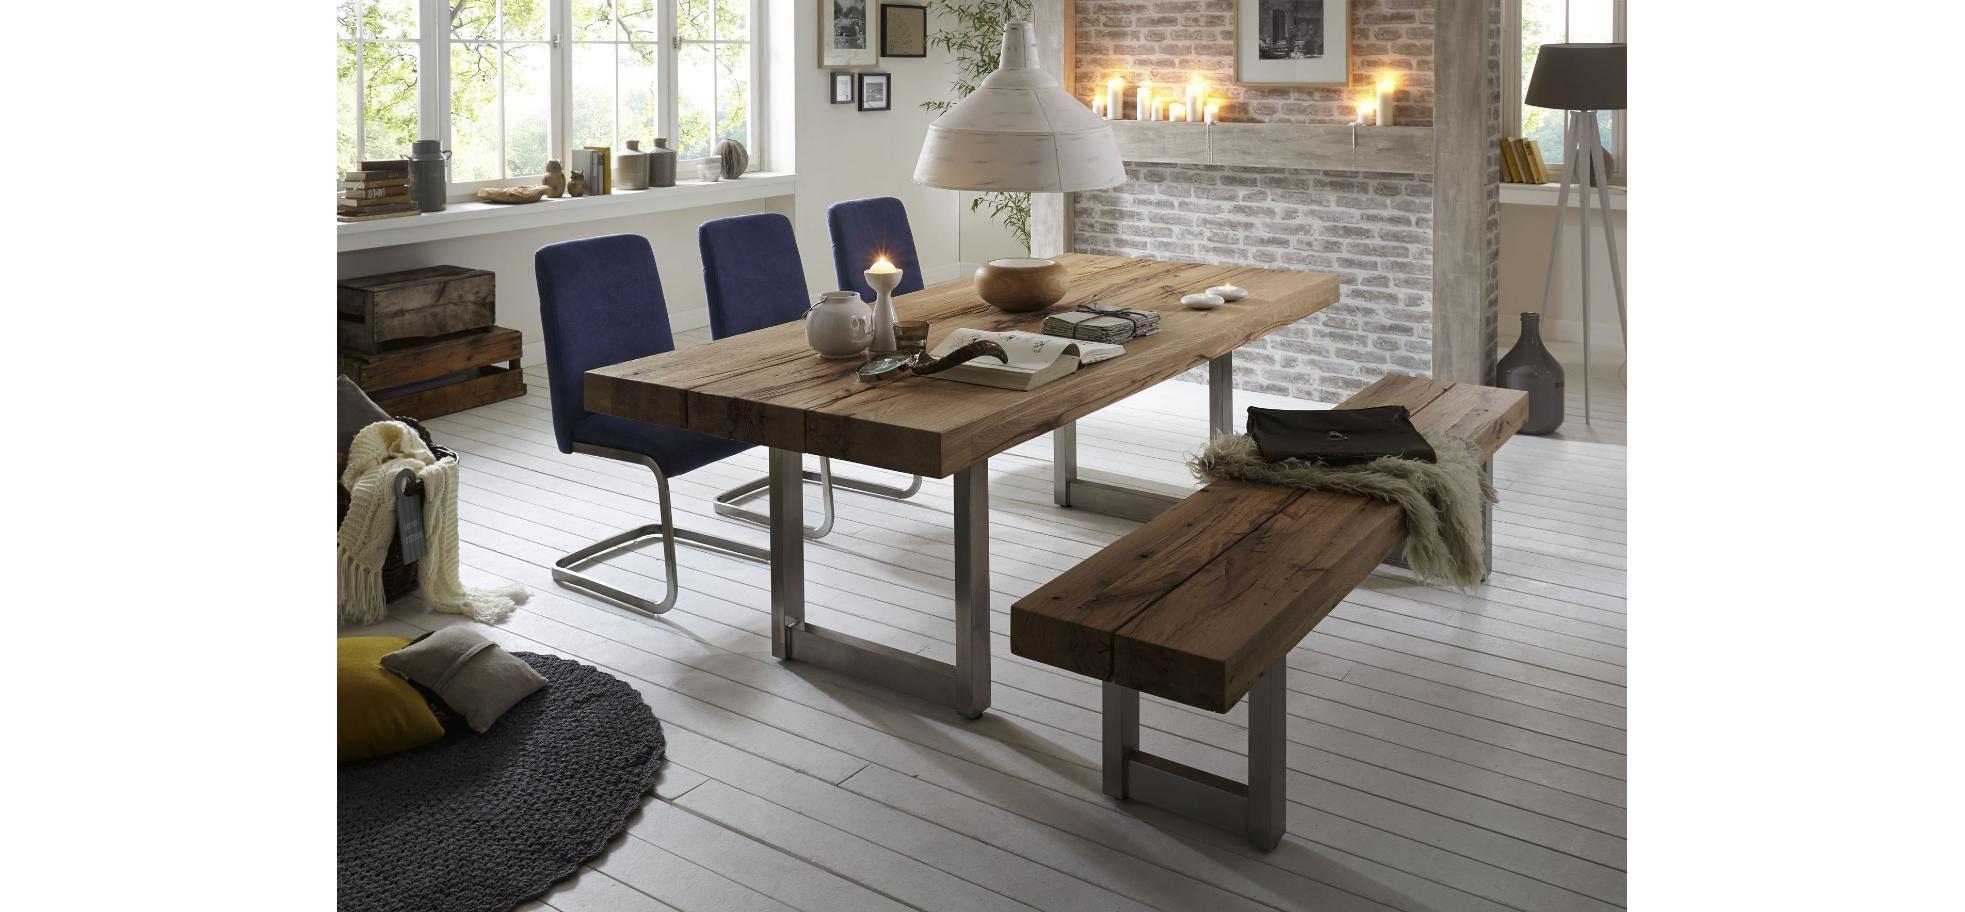 massivholztisch m belhaus pohl wilhelmshaven friesland m belhaus pohl gmbh. Black Bedroom Furniture Sets. Home Design Ideas